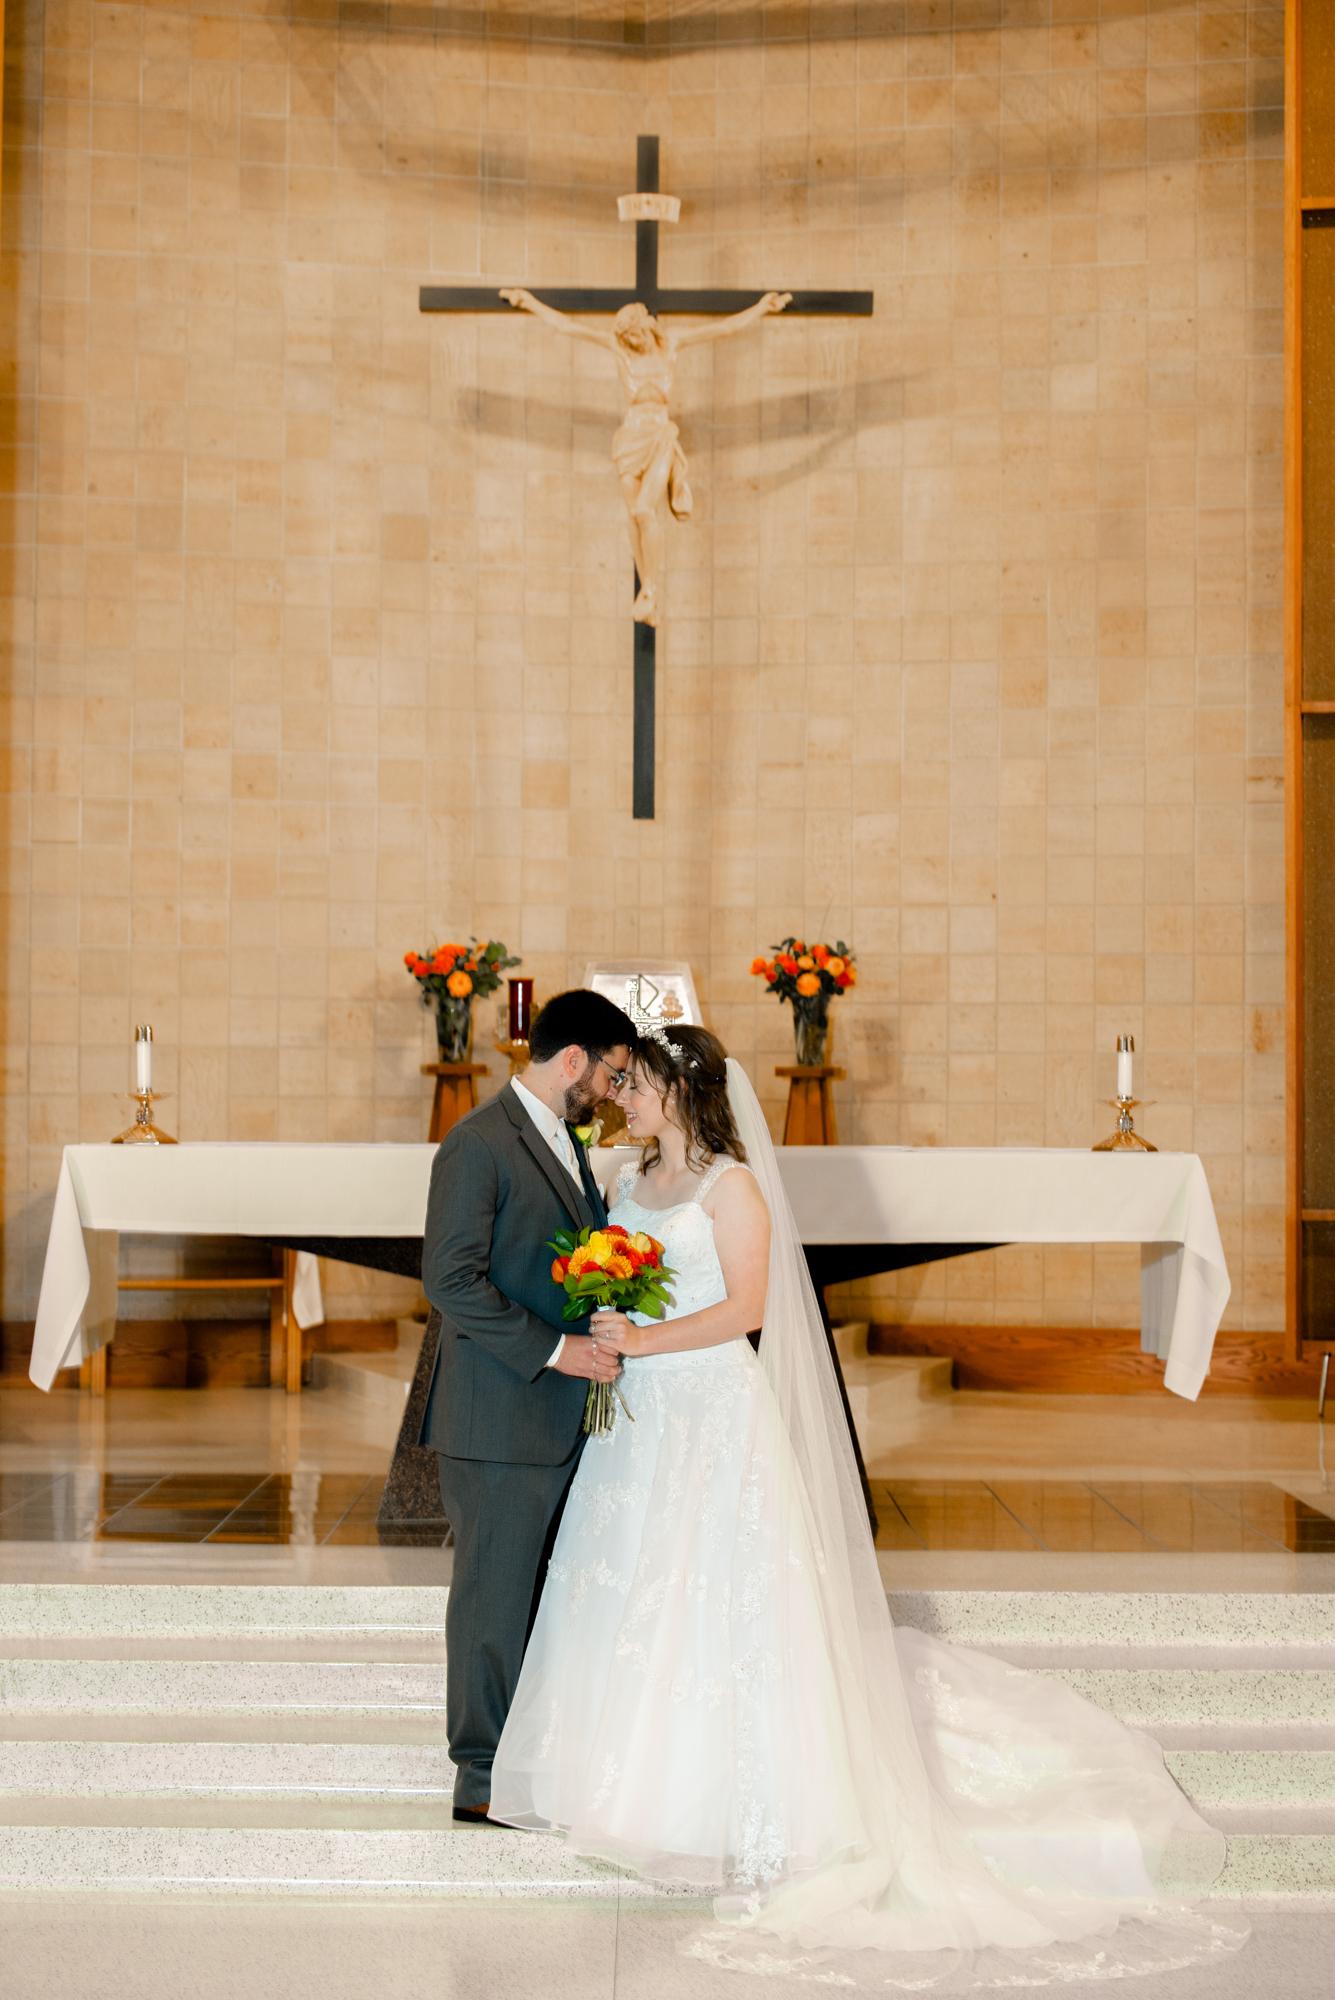 DSC 7616 - Emma and Chris | Fargo Wedding